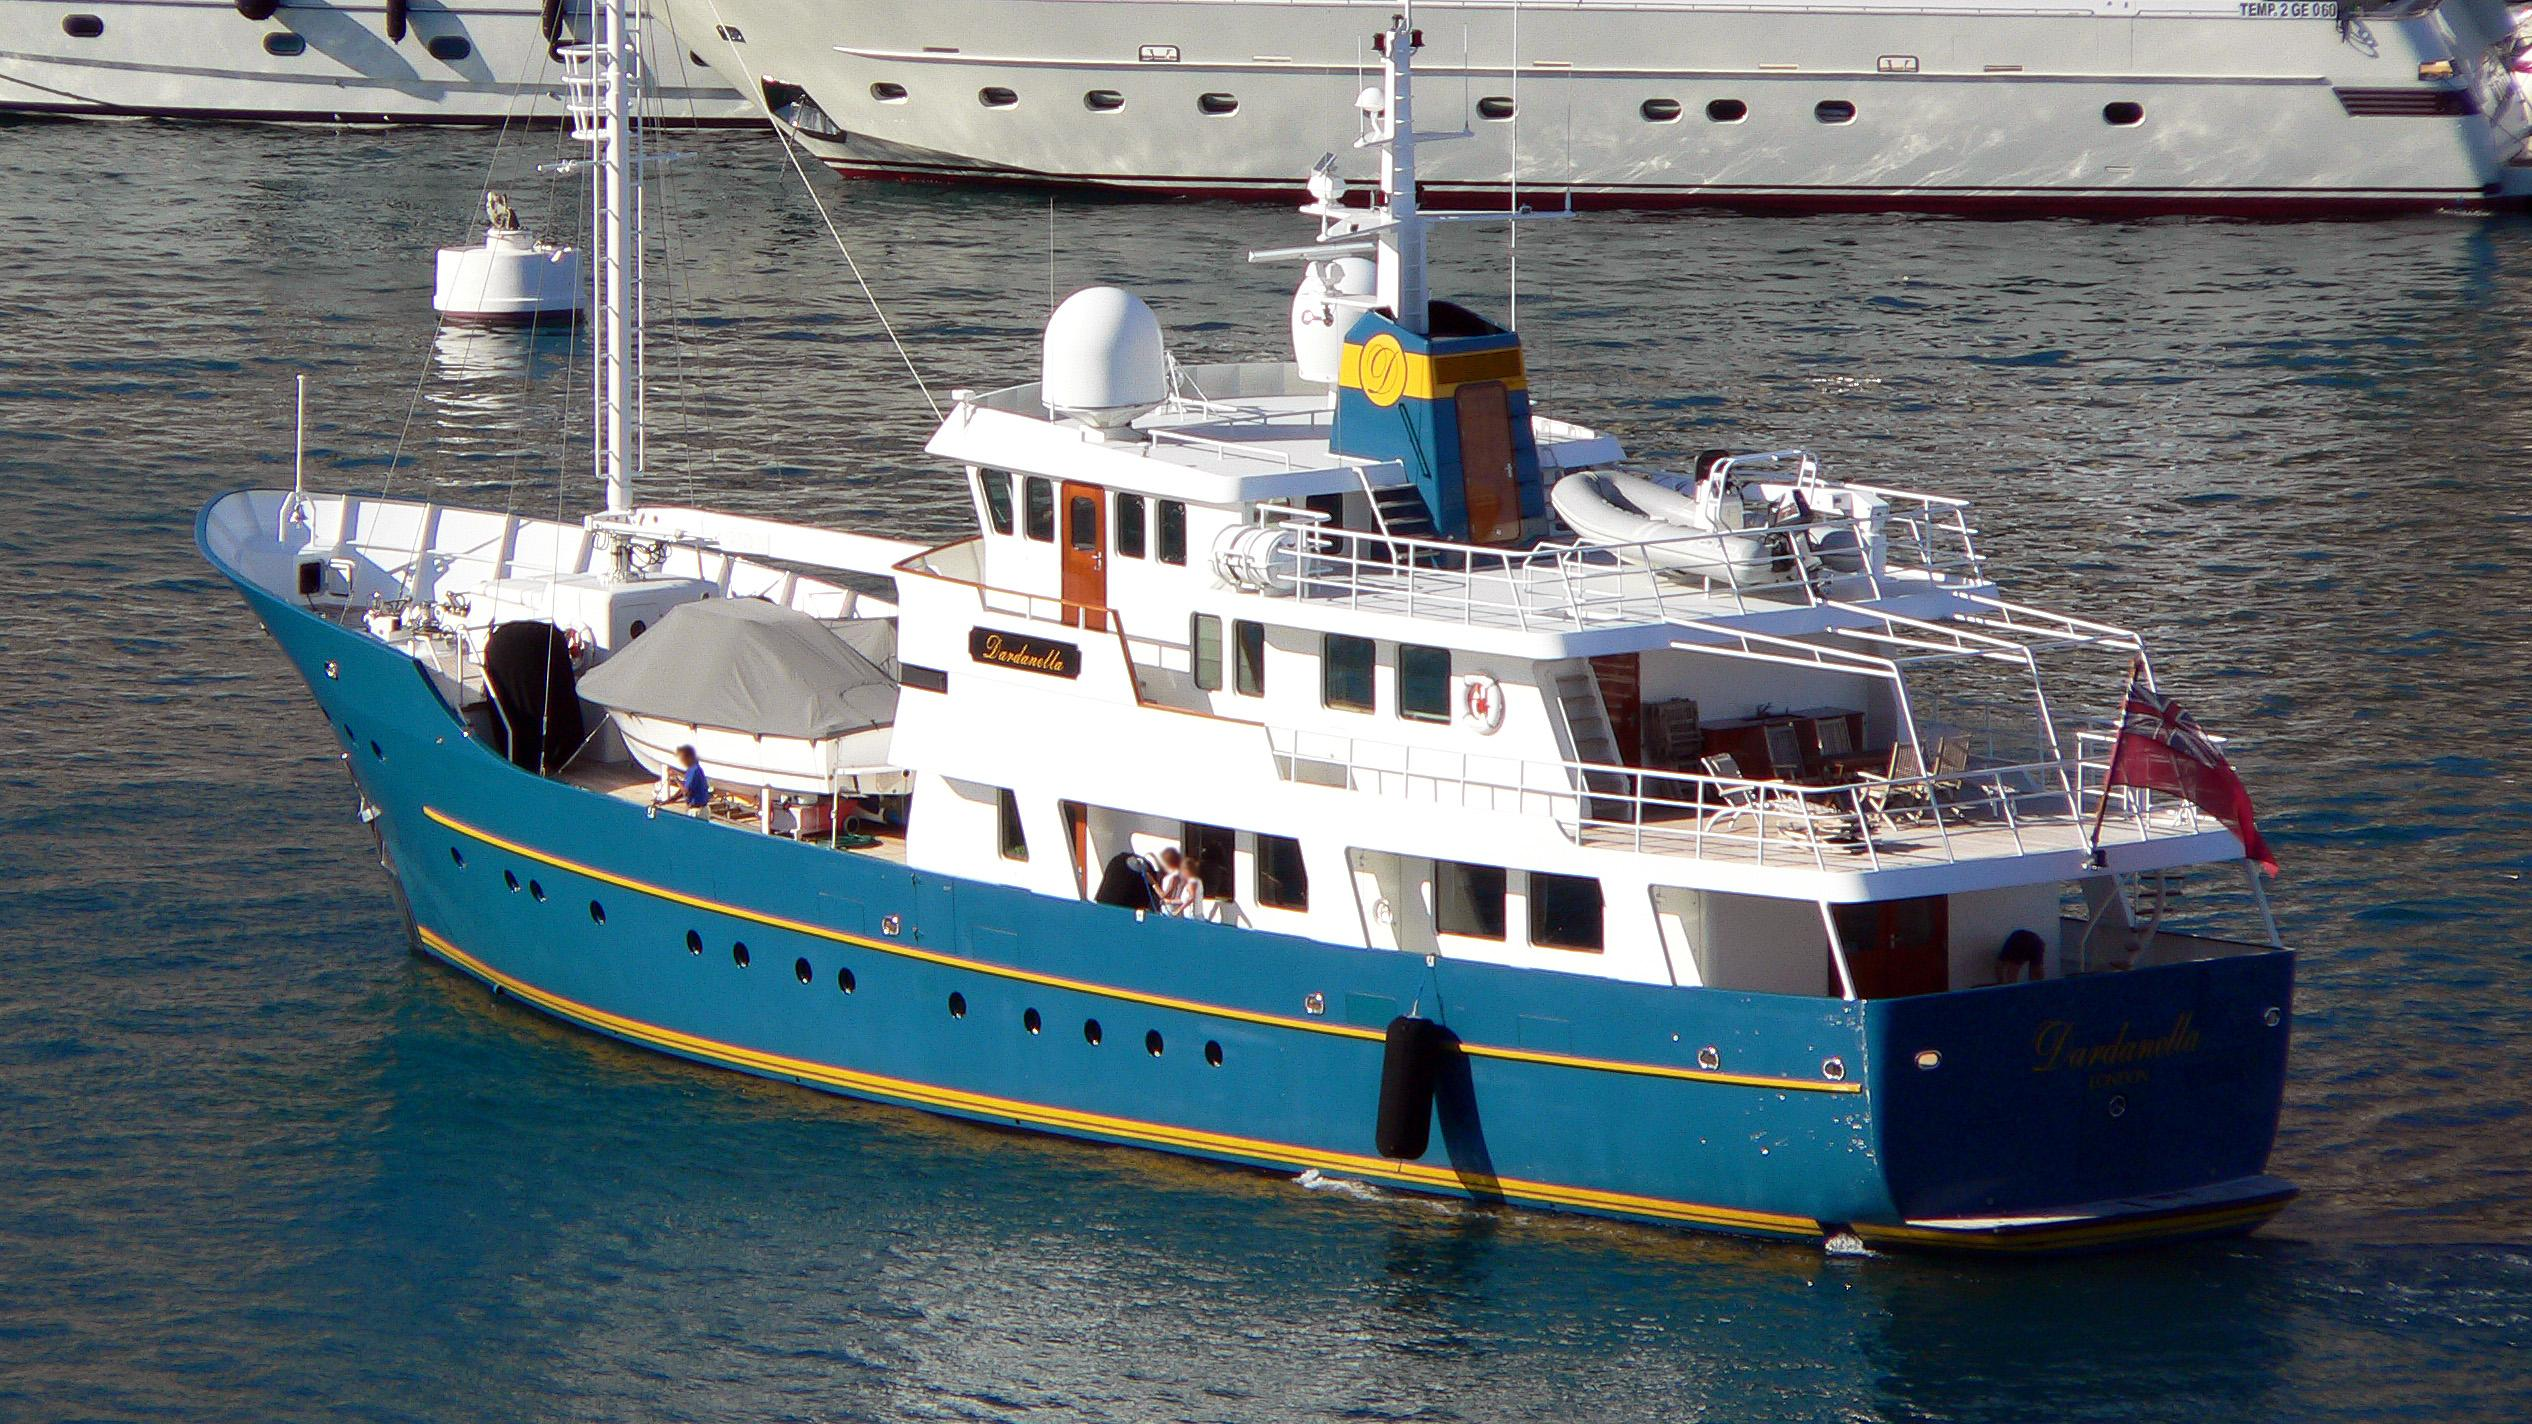 dardanella-explorer-yacht-vitters-1998-37m-before-refit